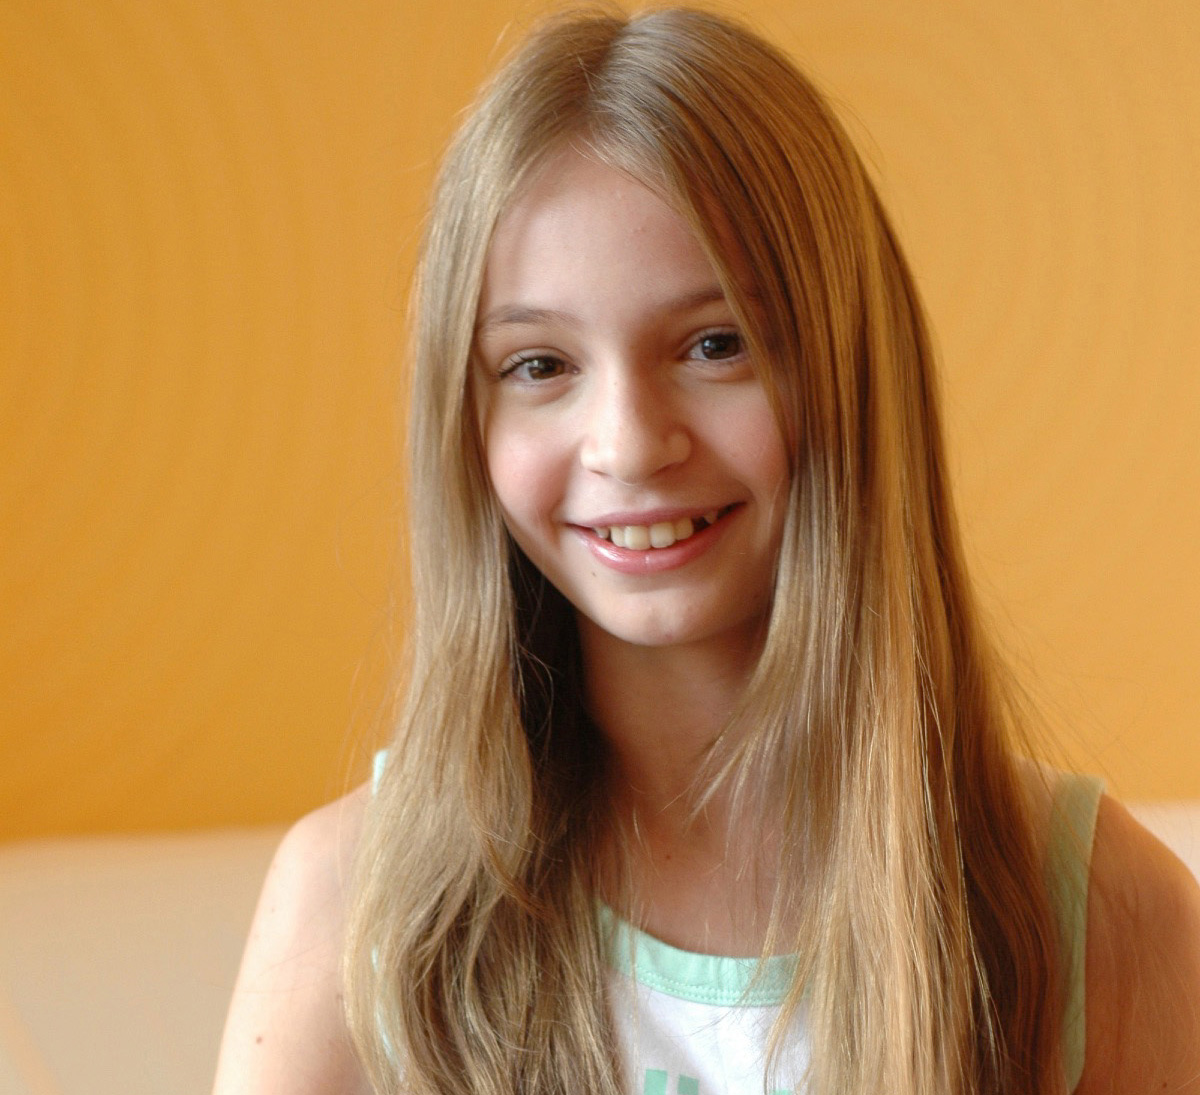 Candydoll TV Teen Model